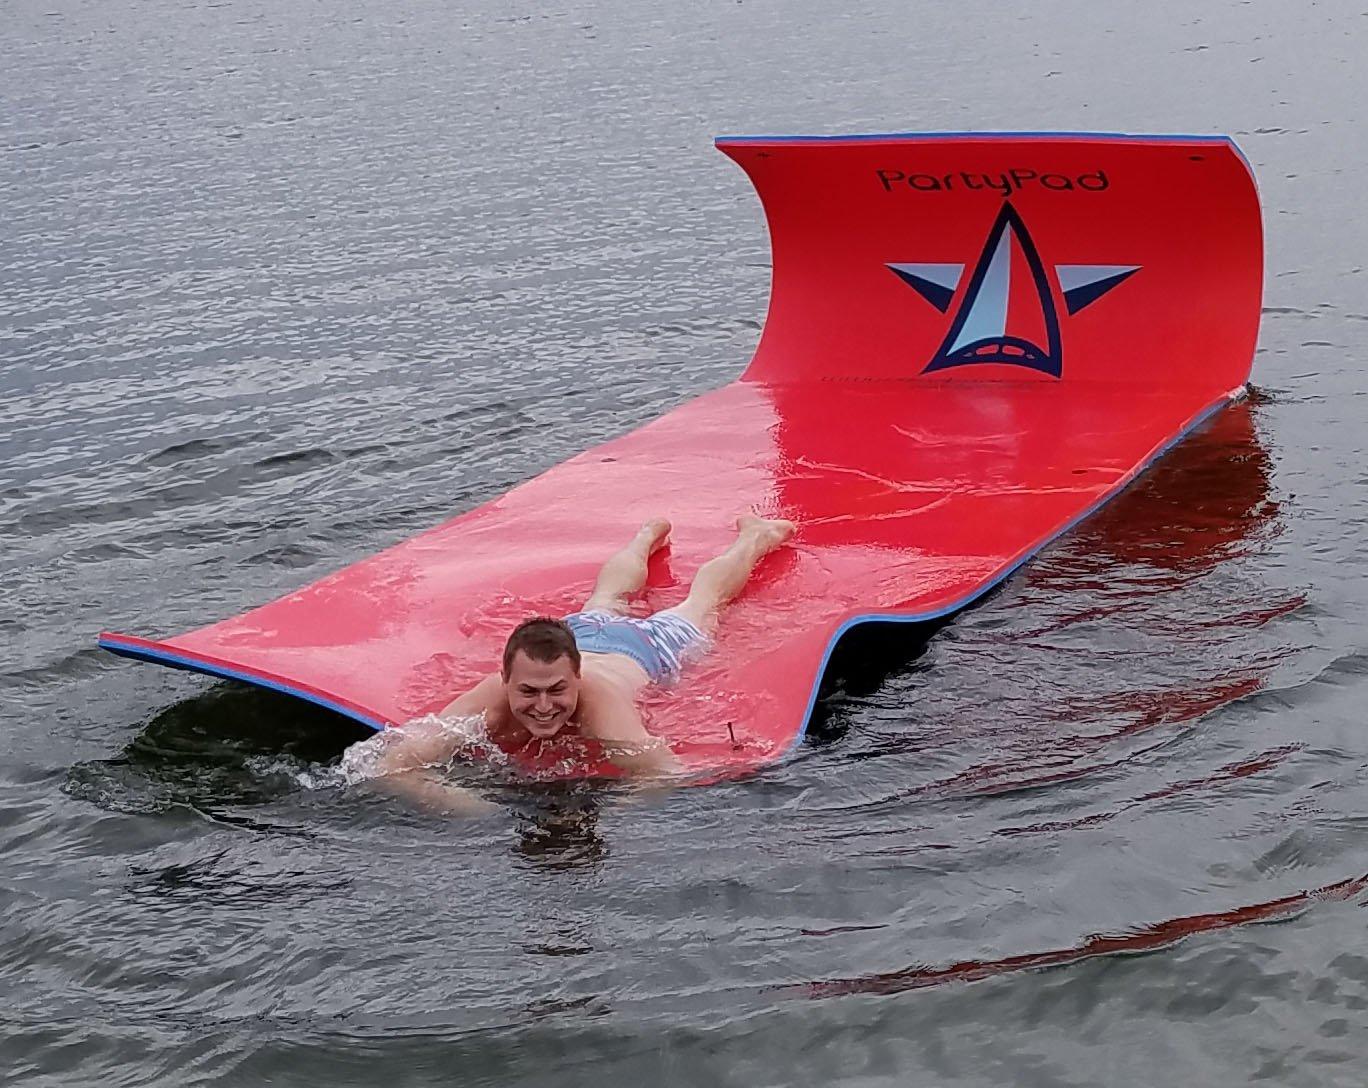 Vico Marine Floating Foam Pad - Red/Blue by Vico Marine (Image #5)